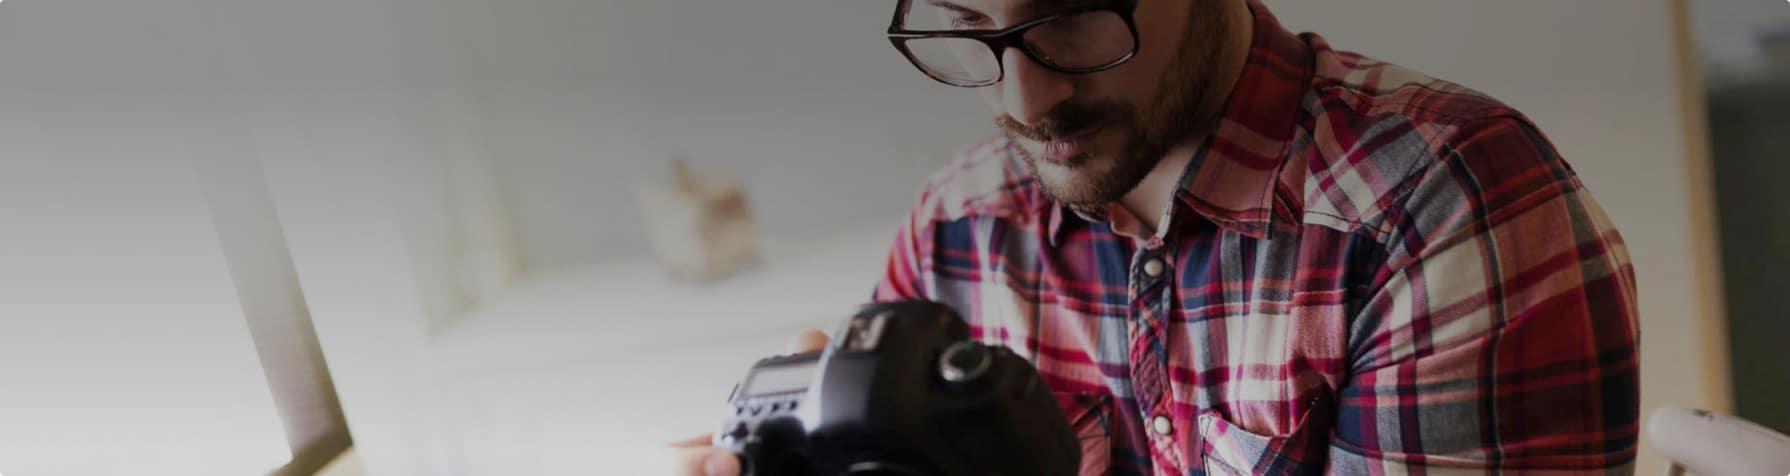 Photography Business Insurance Cost - Desktop